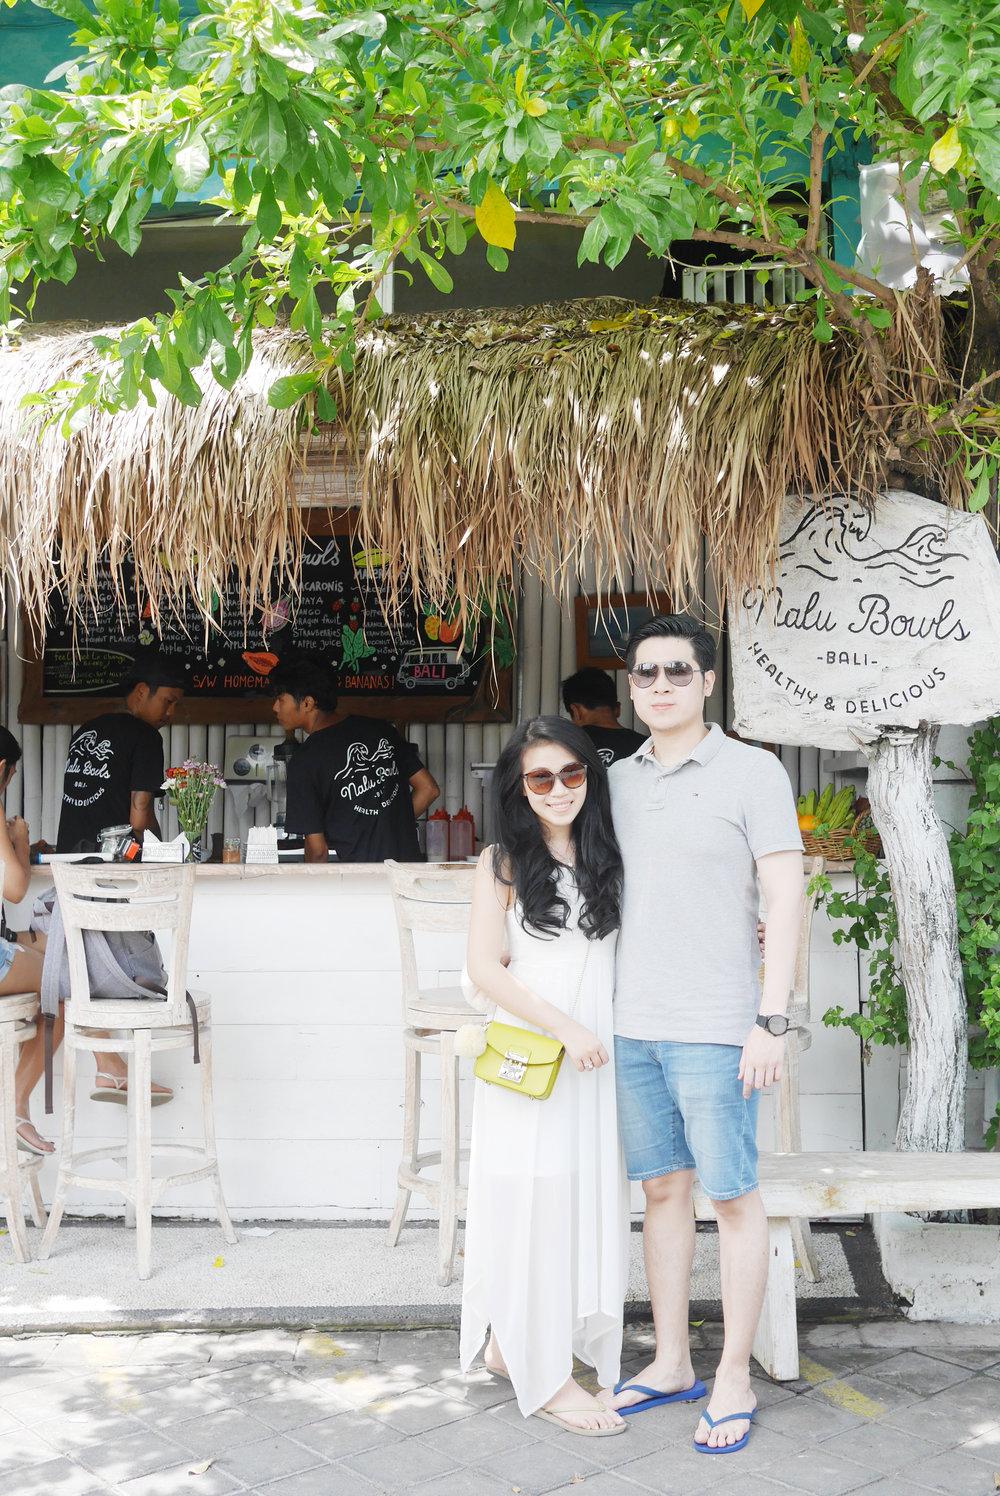 GunawanMelisa_Bali06_NaluBowls